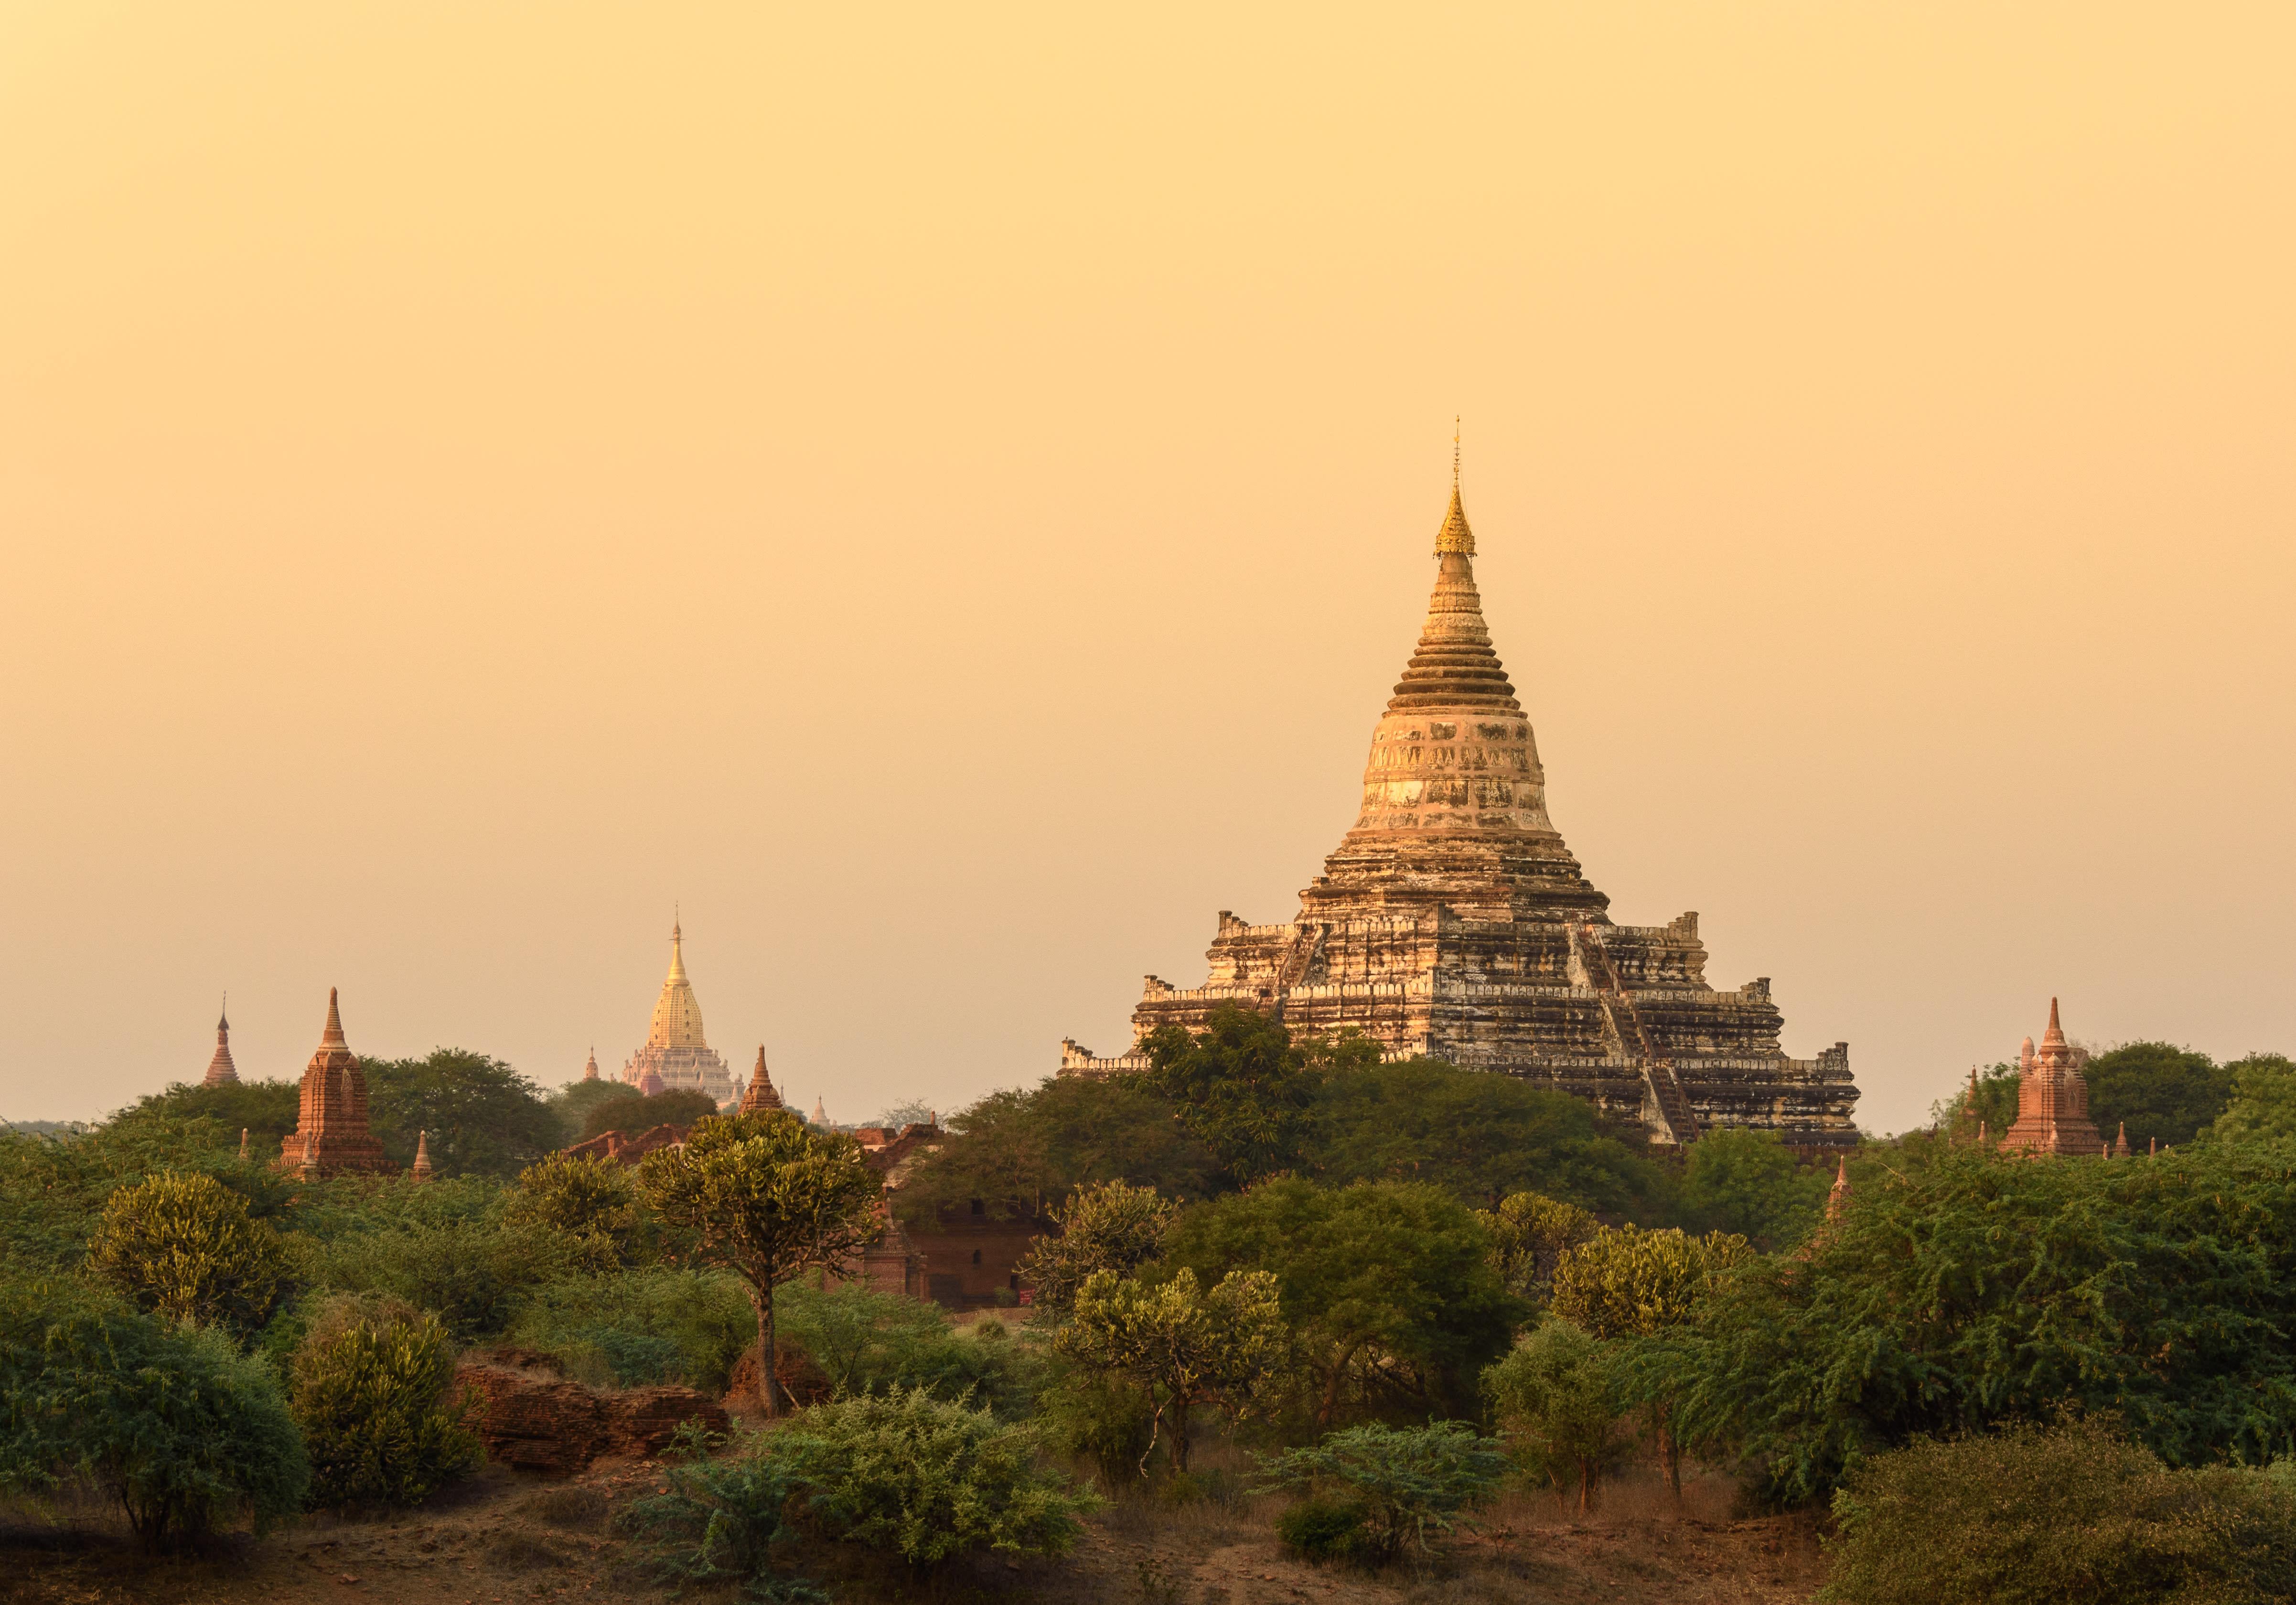 Bagan, Myanmar View Overlooking Temple Through Trees